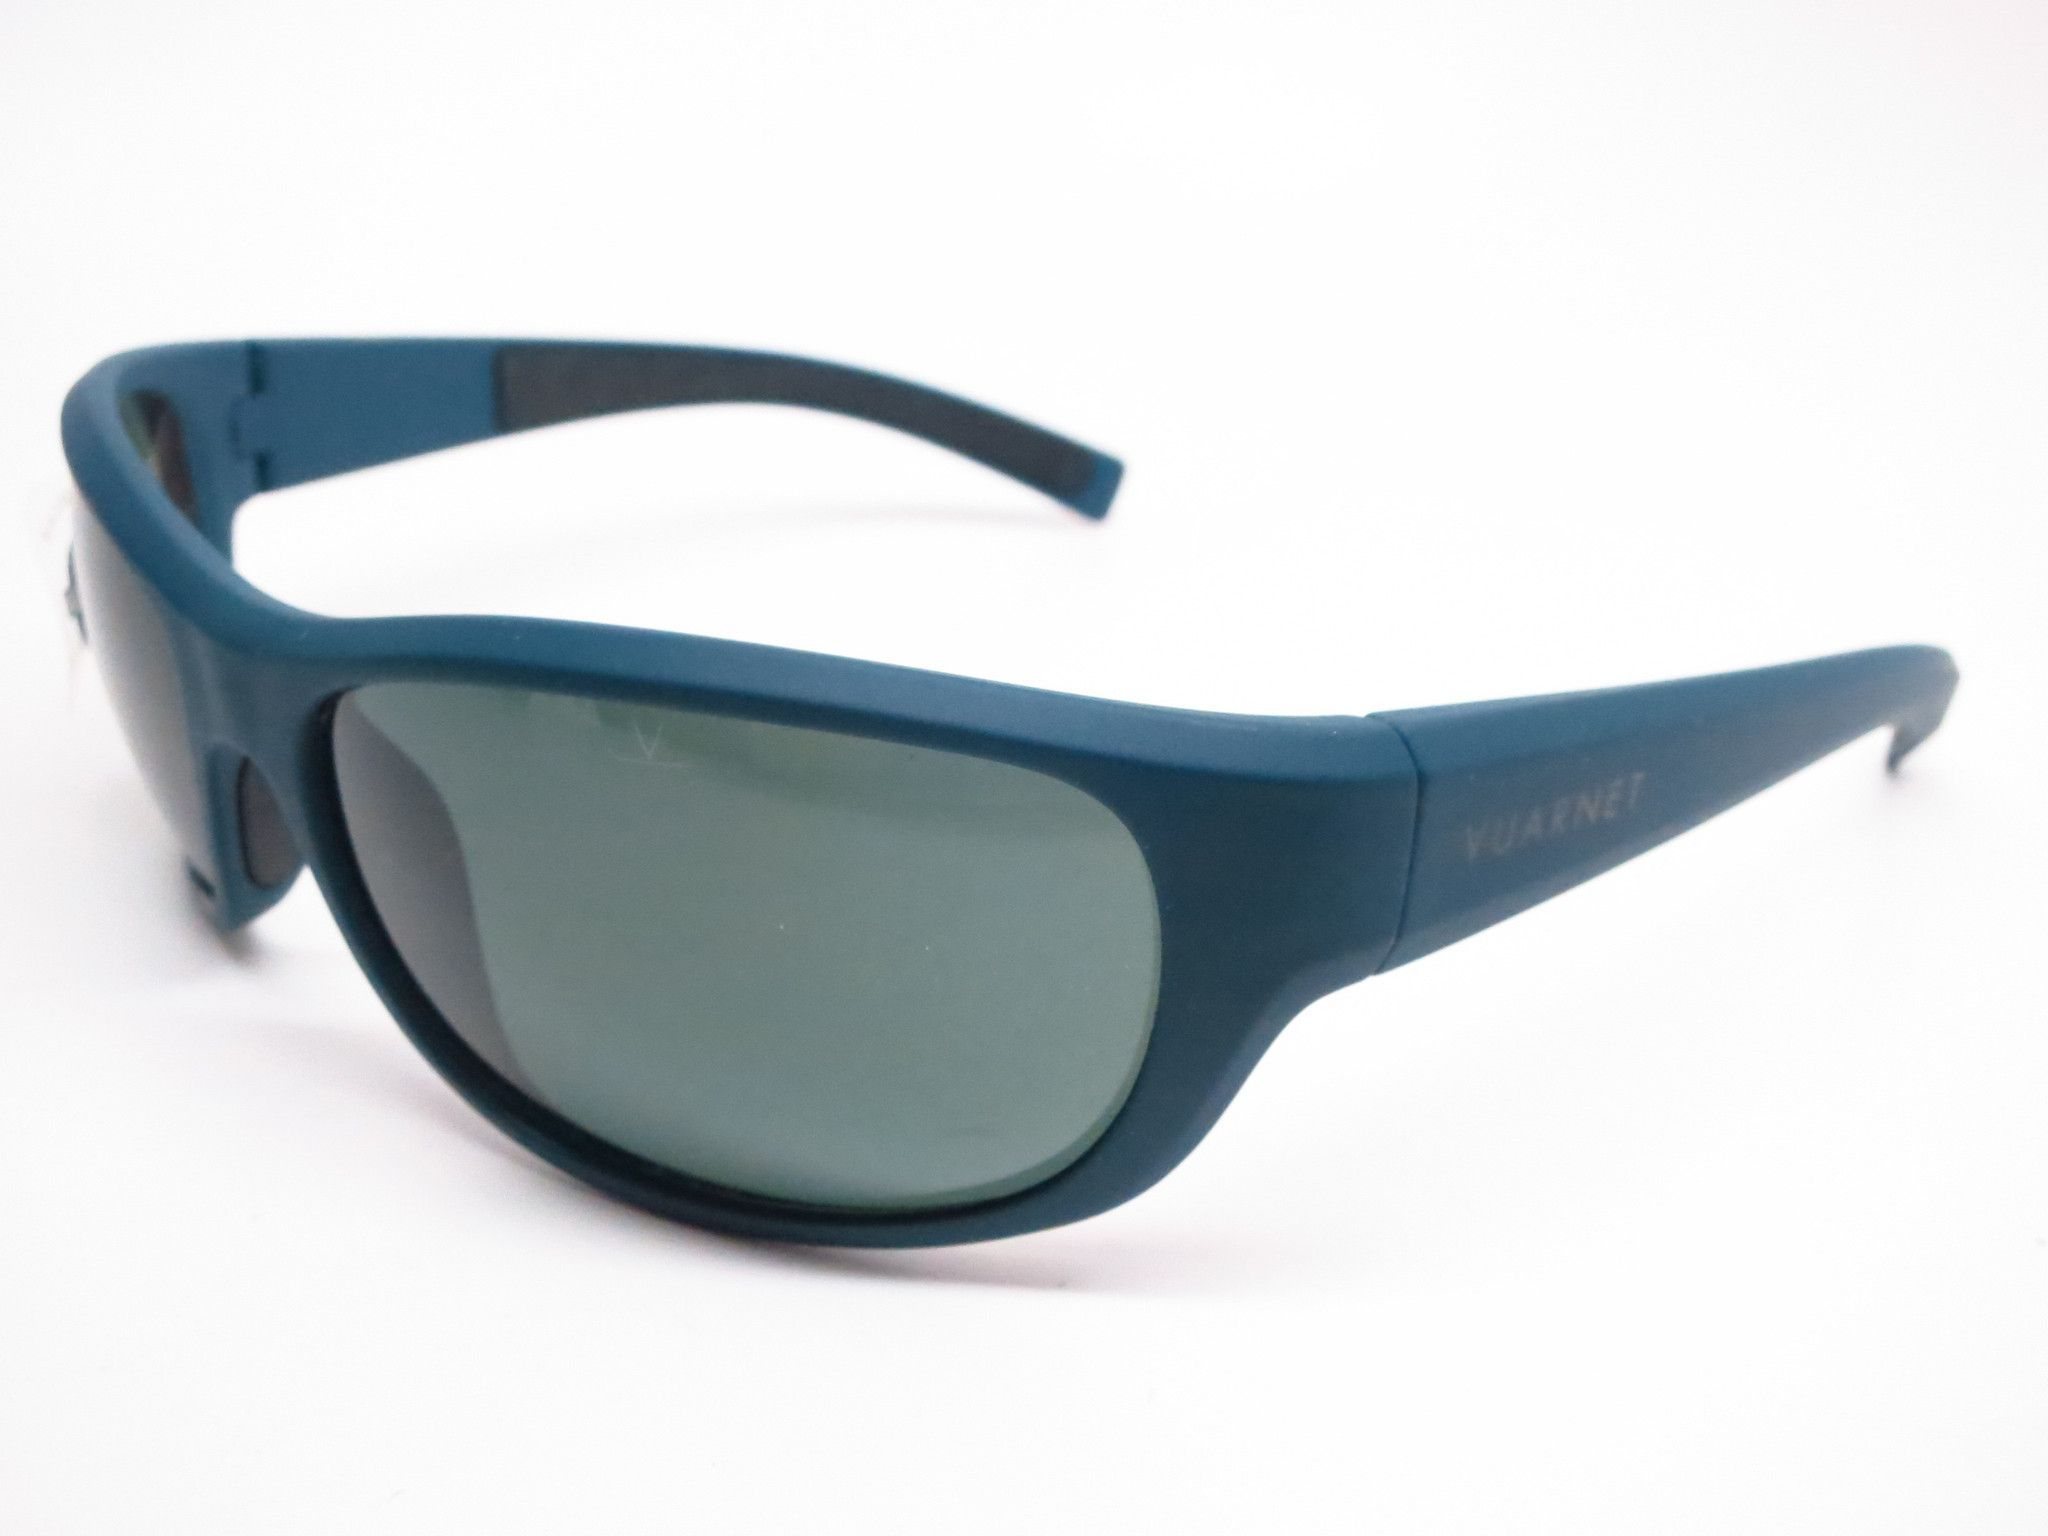 a90d519af2 Vuarnet VL 1522 Blue 0005 1622 Sunglasses